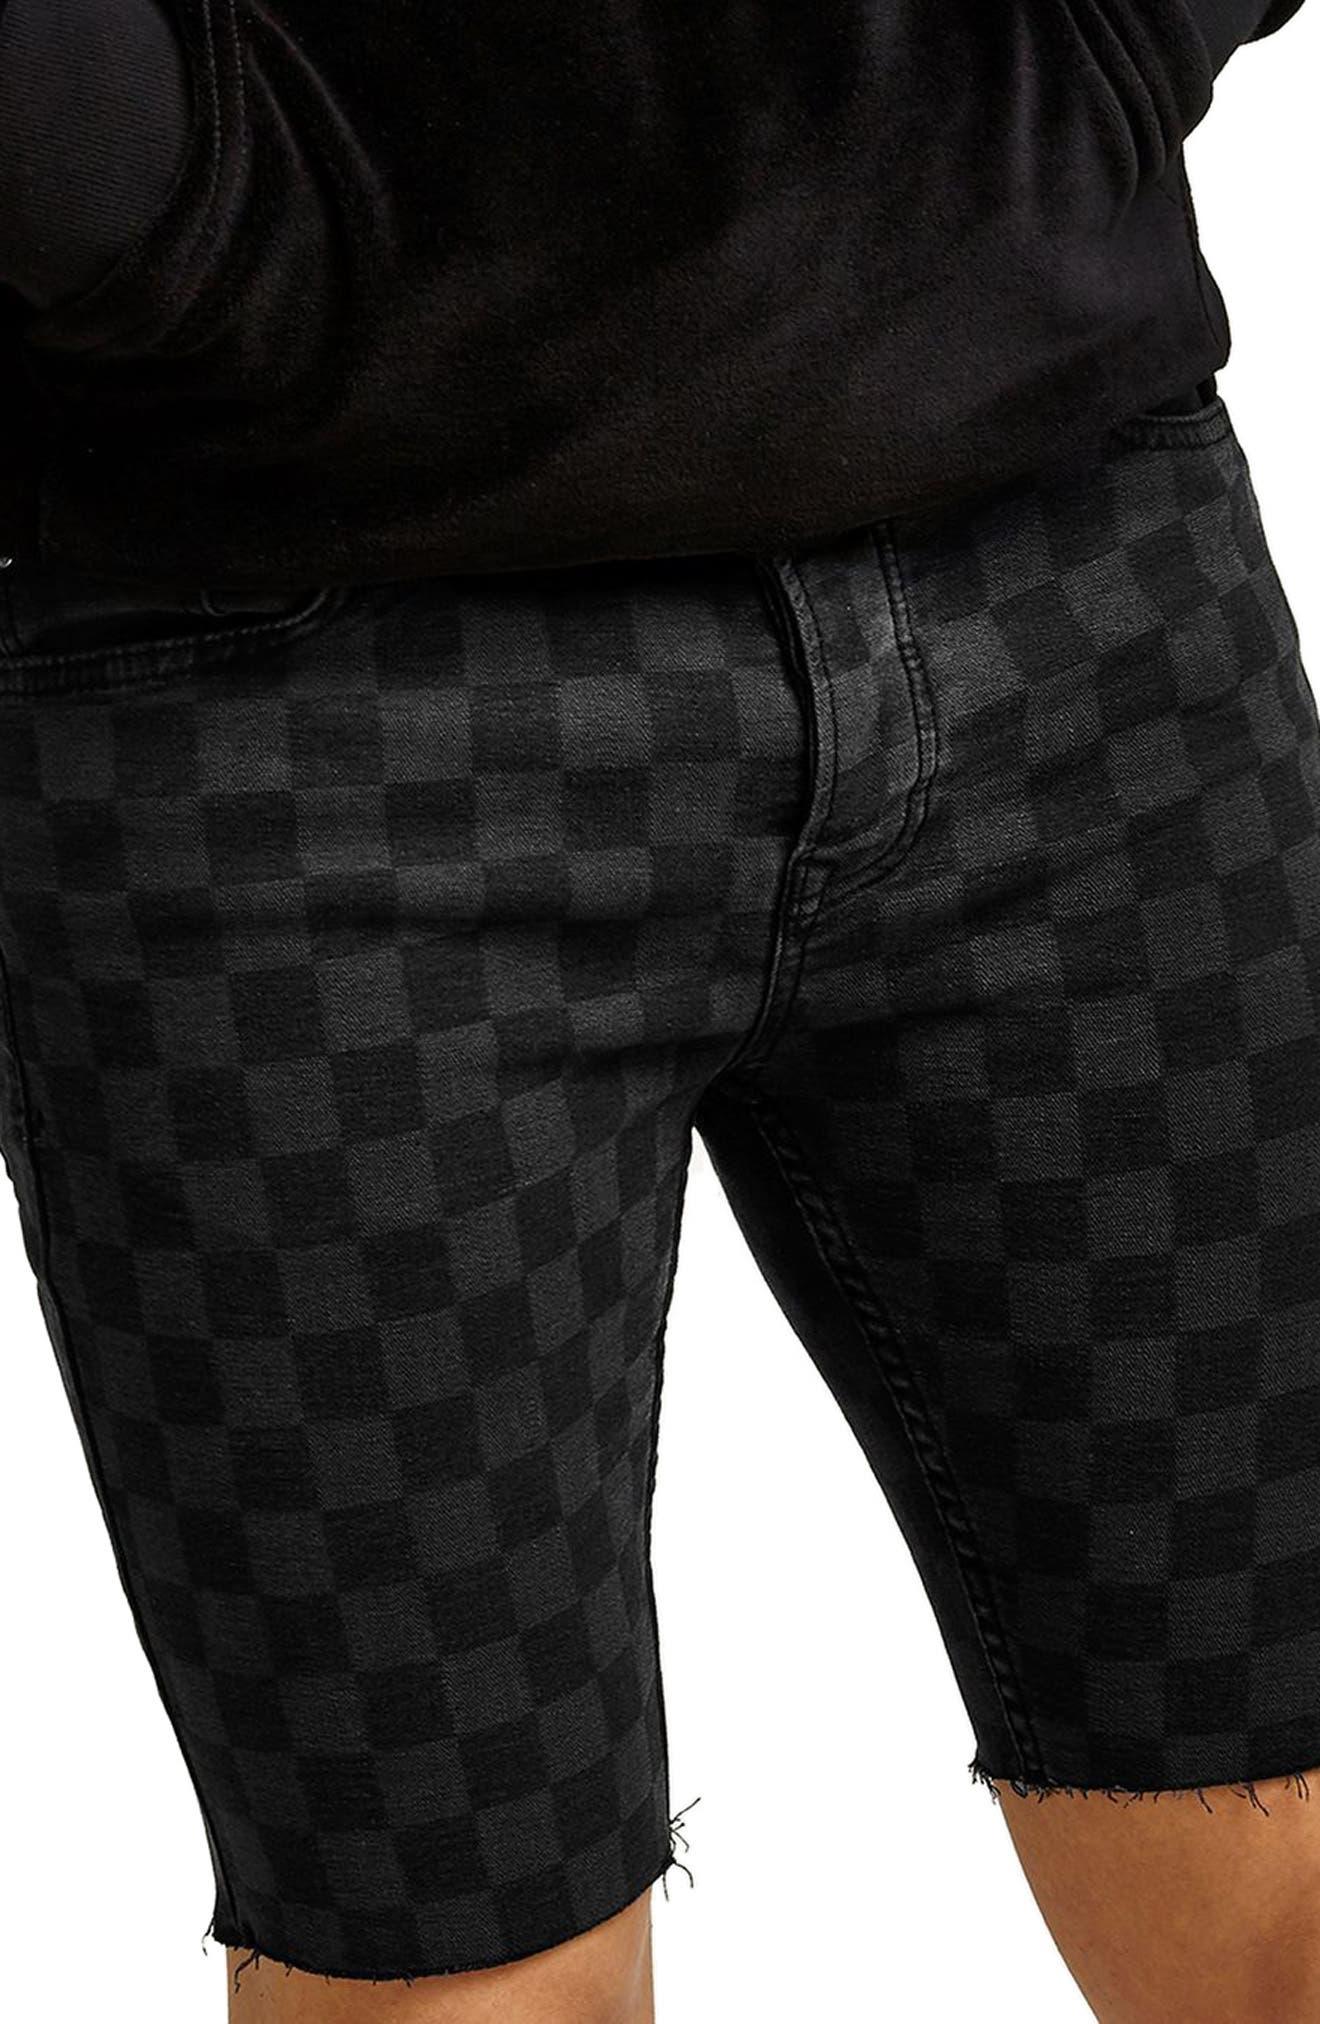 Stretch Skinny Fit Check Denim Shorts,                             Main thumbnail 1, color,                             Black